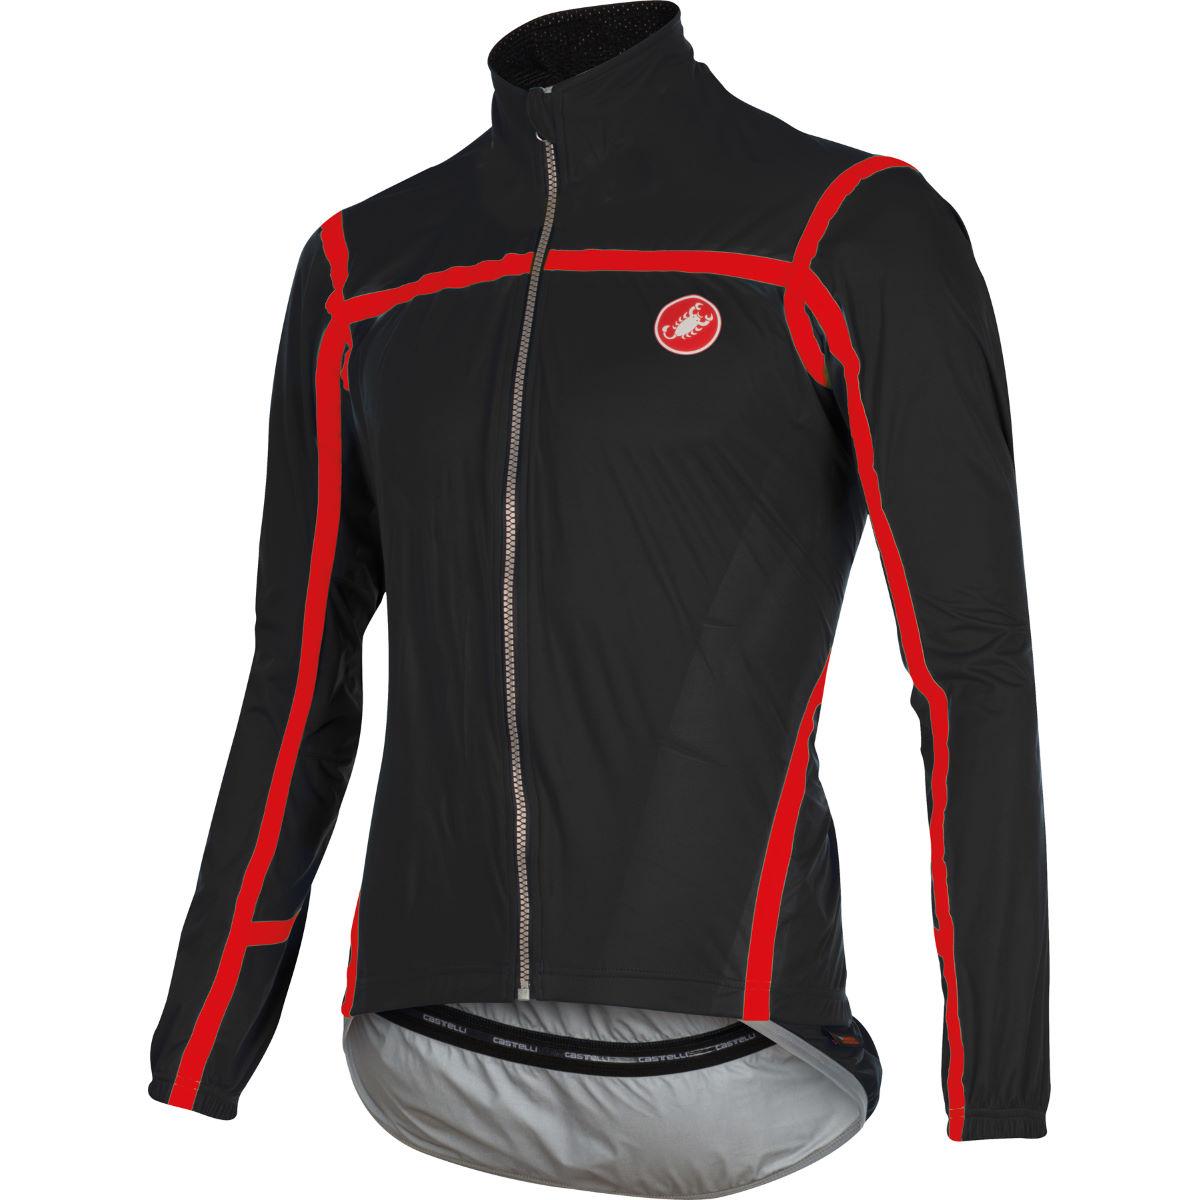 Chaqueta Castelli Pavè - Impermeables - ciclismo